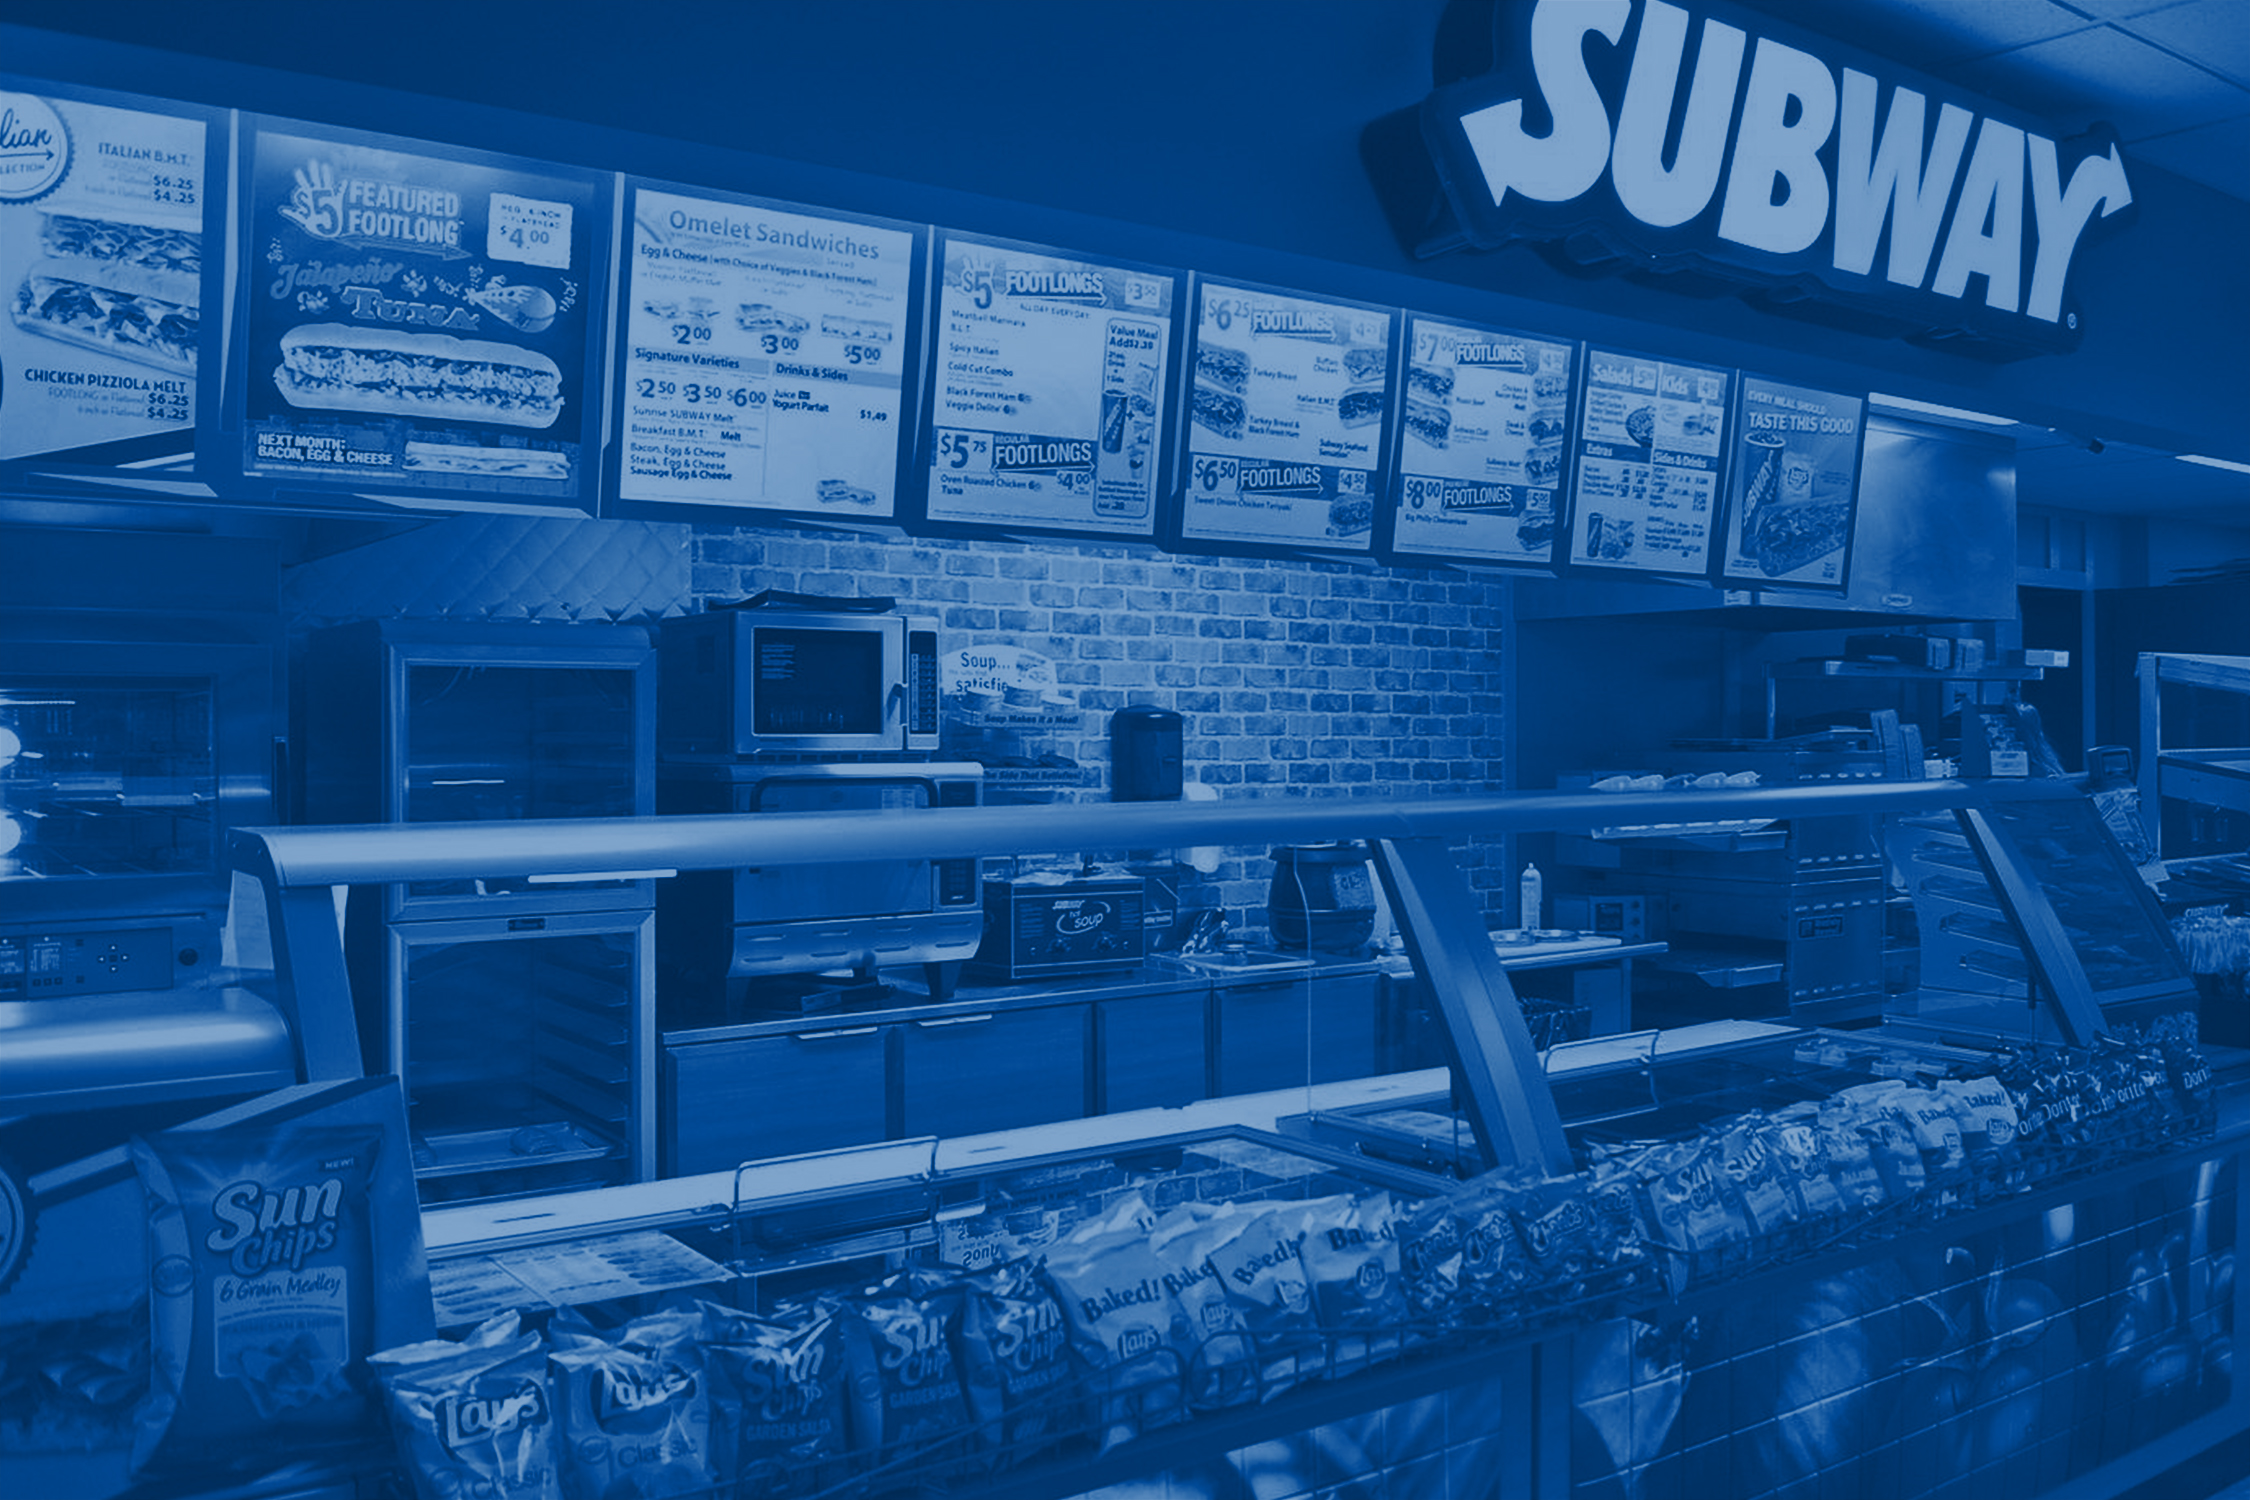 Subway -